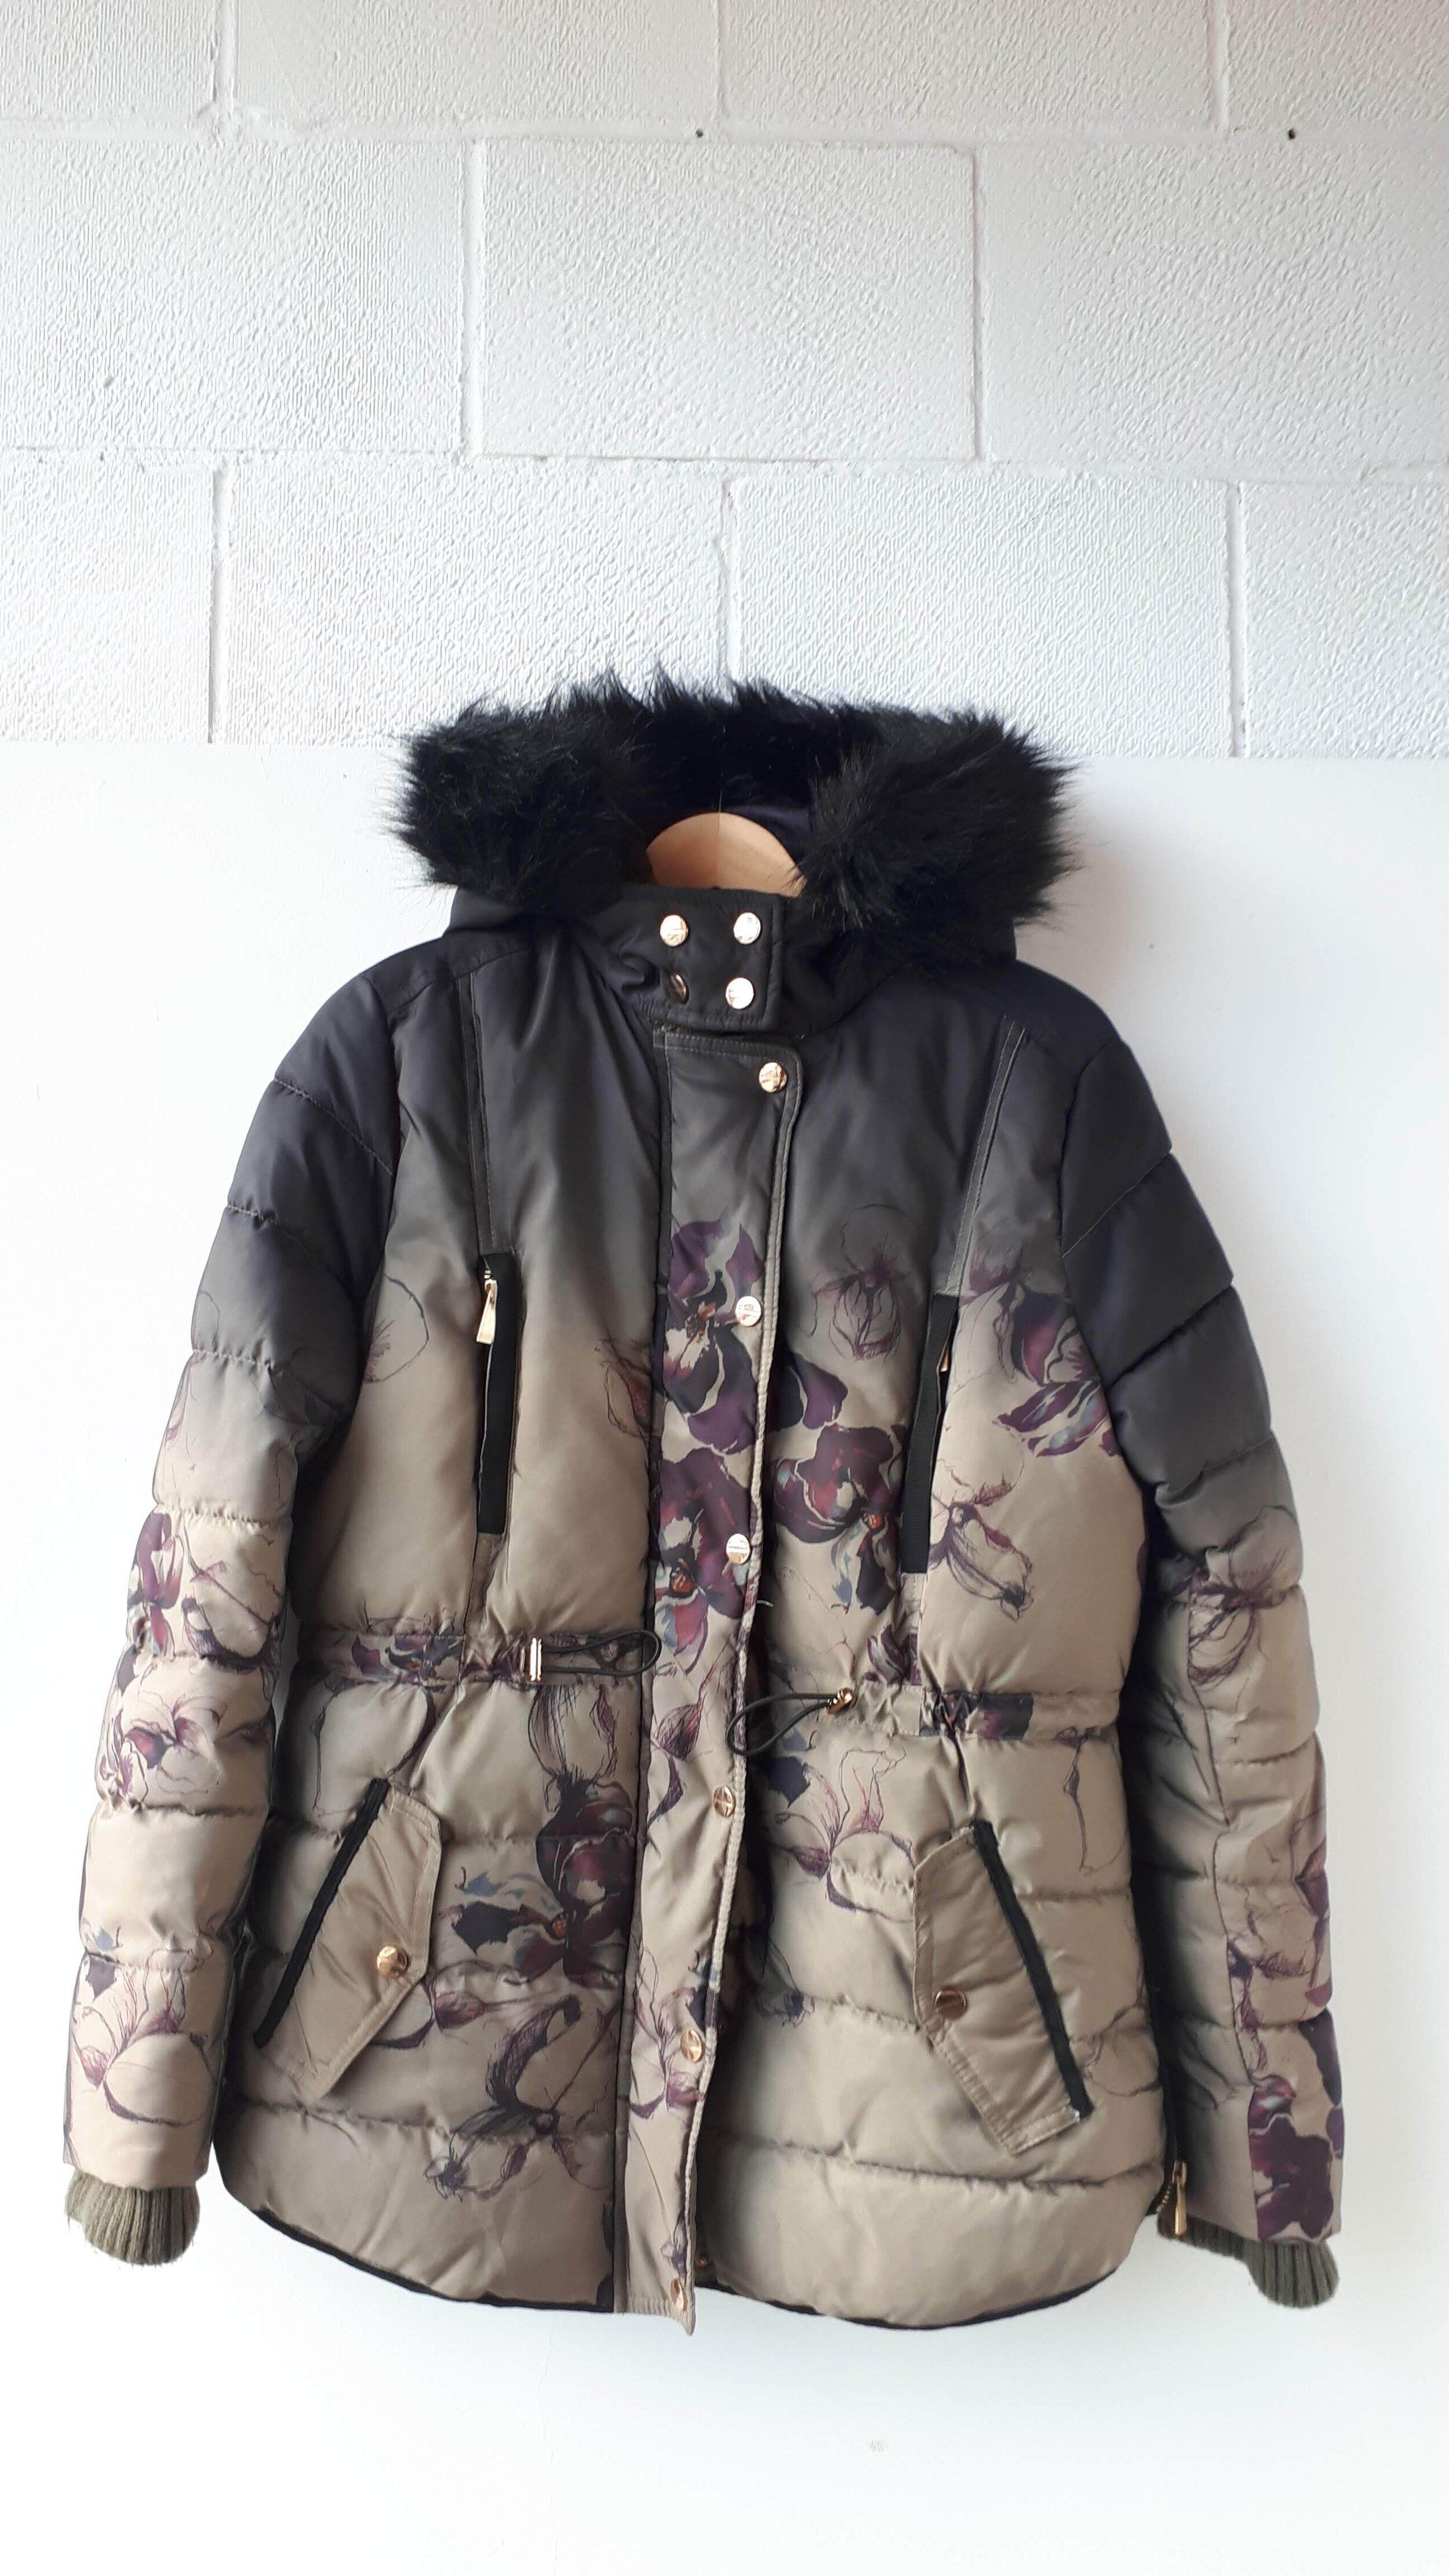 Desigual coat; Size M, $62